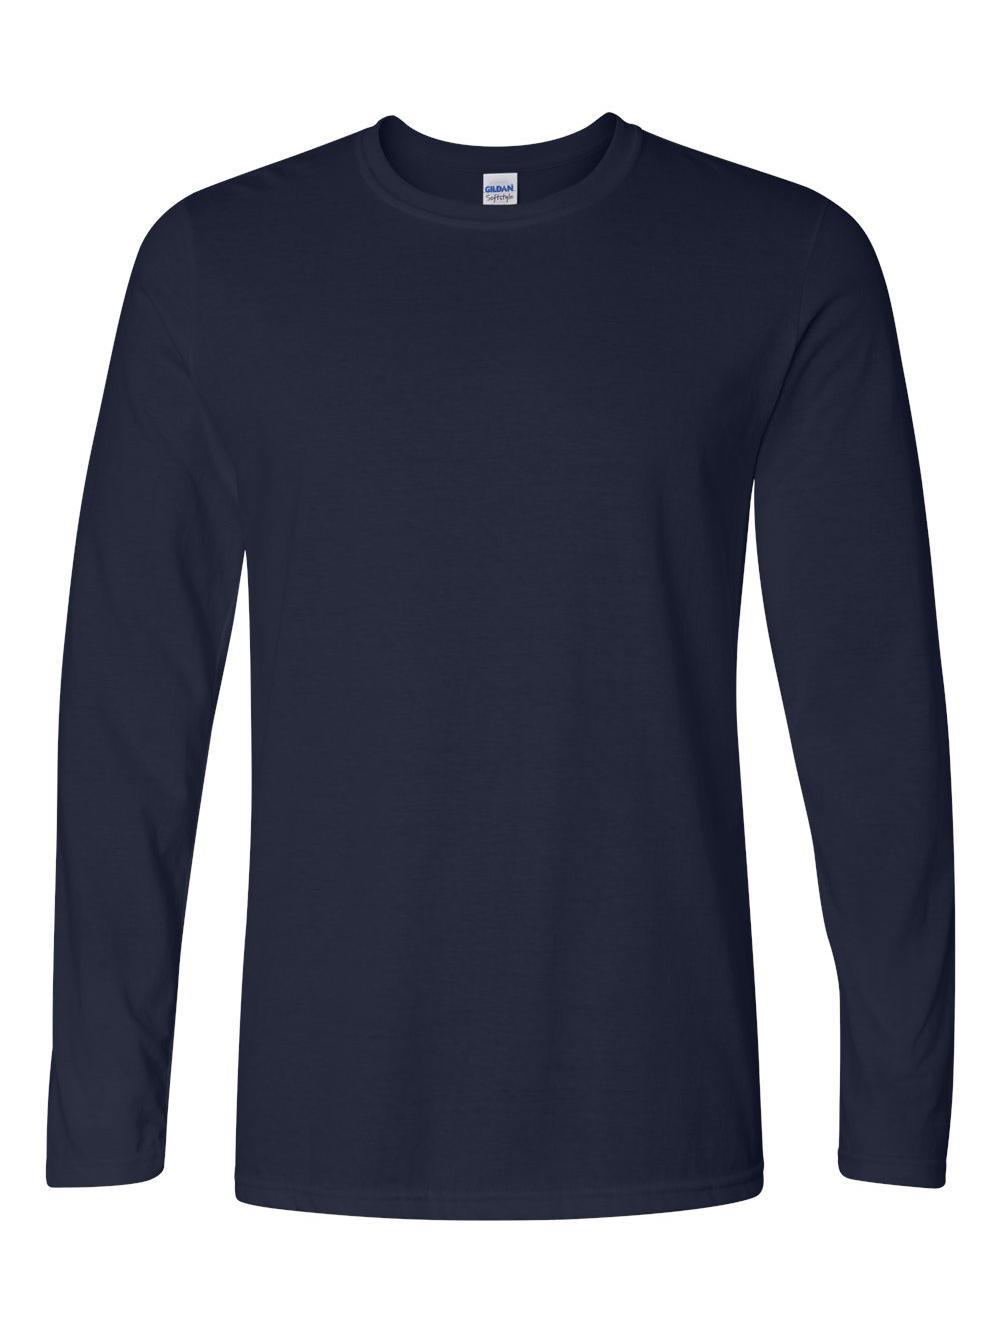 Gildan-Softstyle-Long-Sleeve-T-Shirt-64400 thumbnail 15